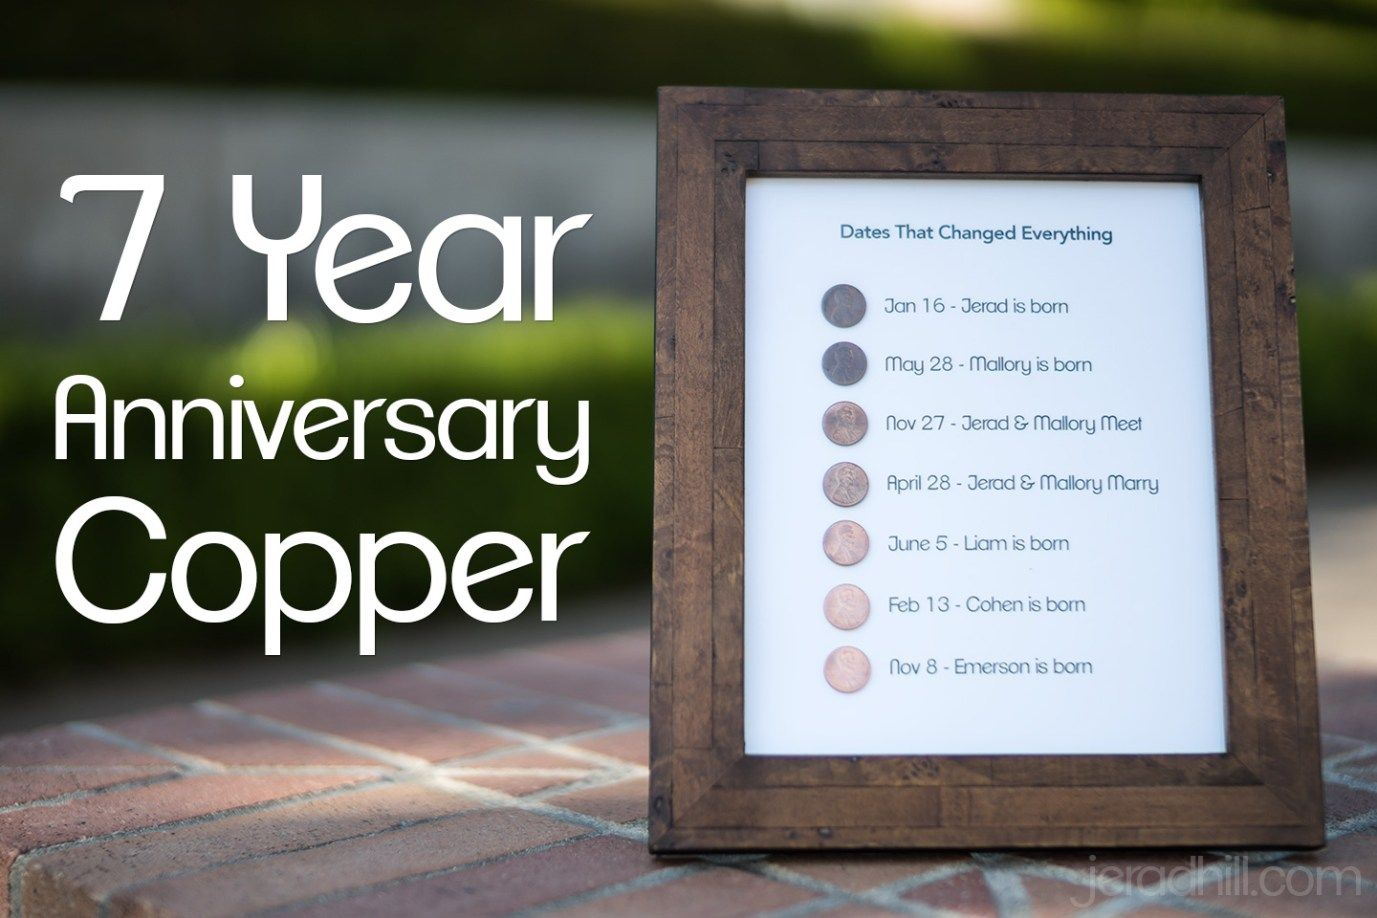 7 year dating anniversary gift ideas